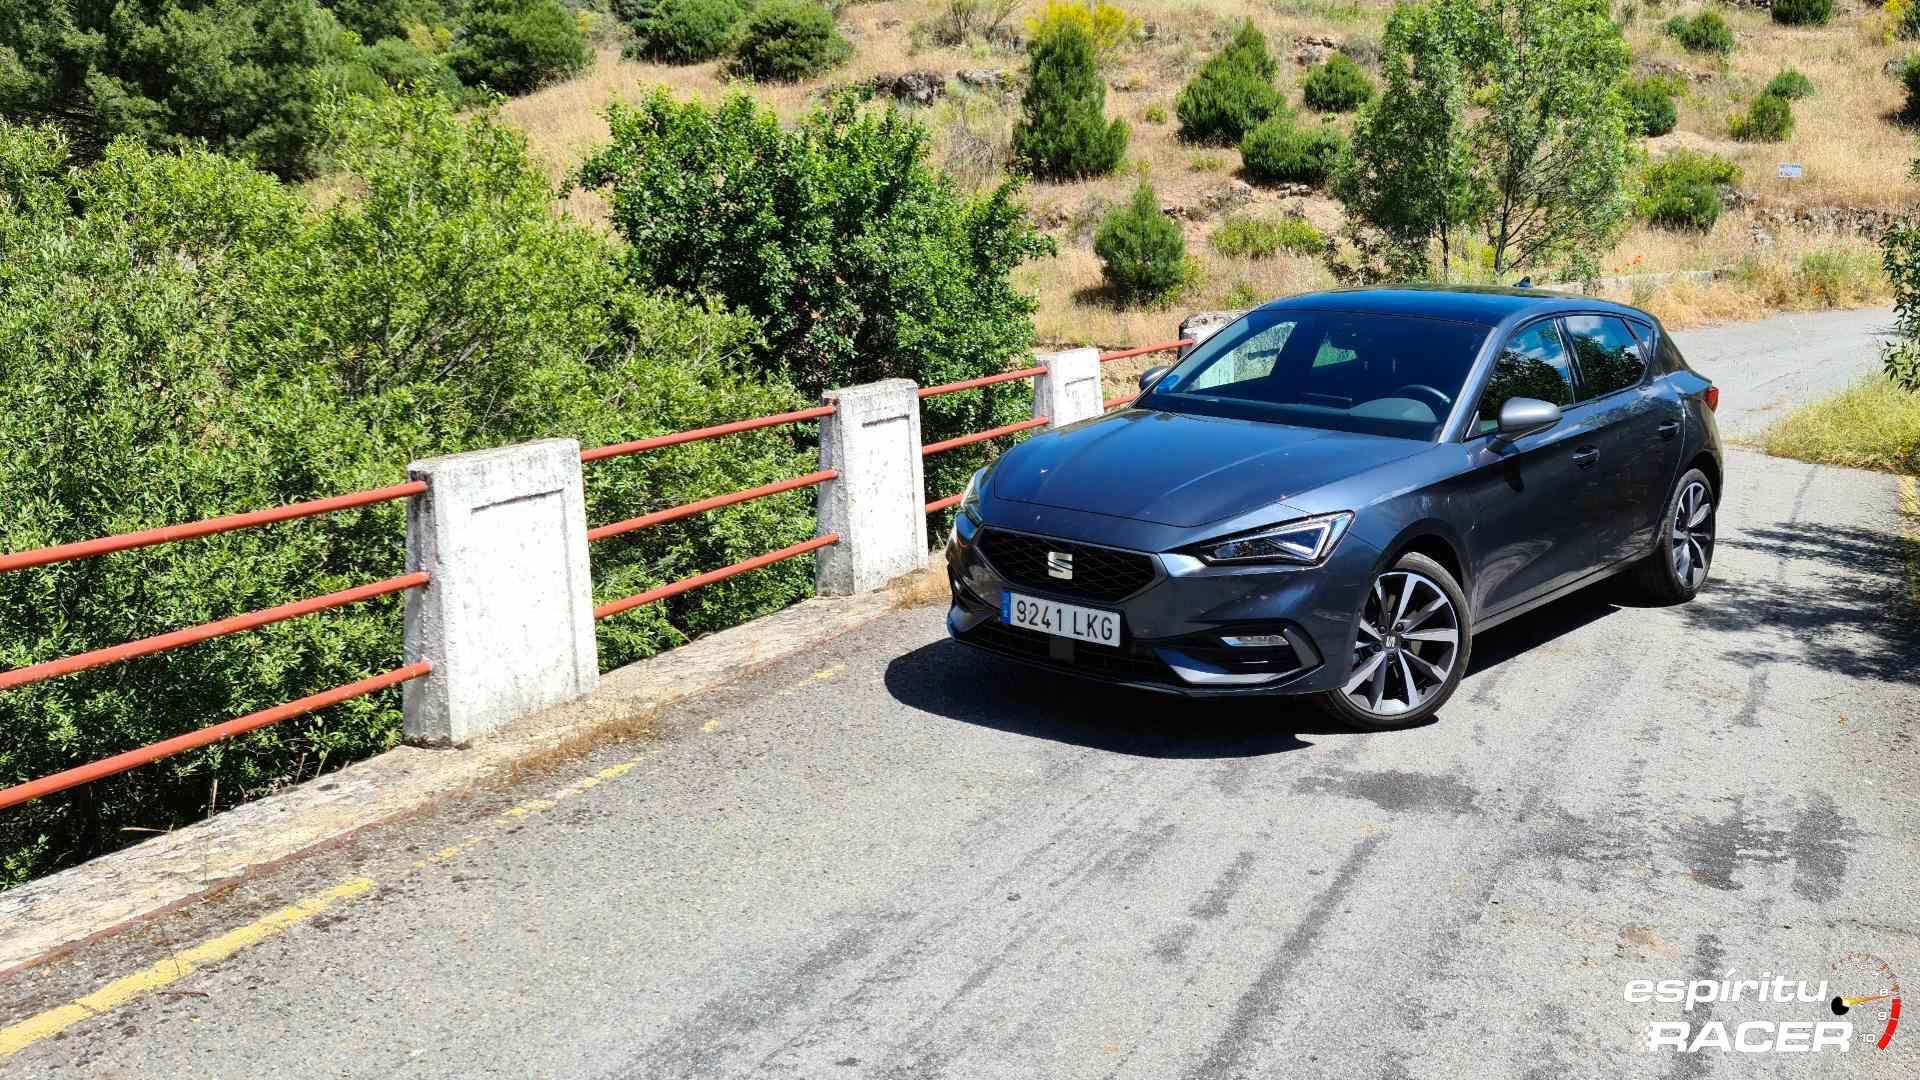 Prueba: SEAT León e-Hybrid